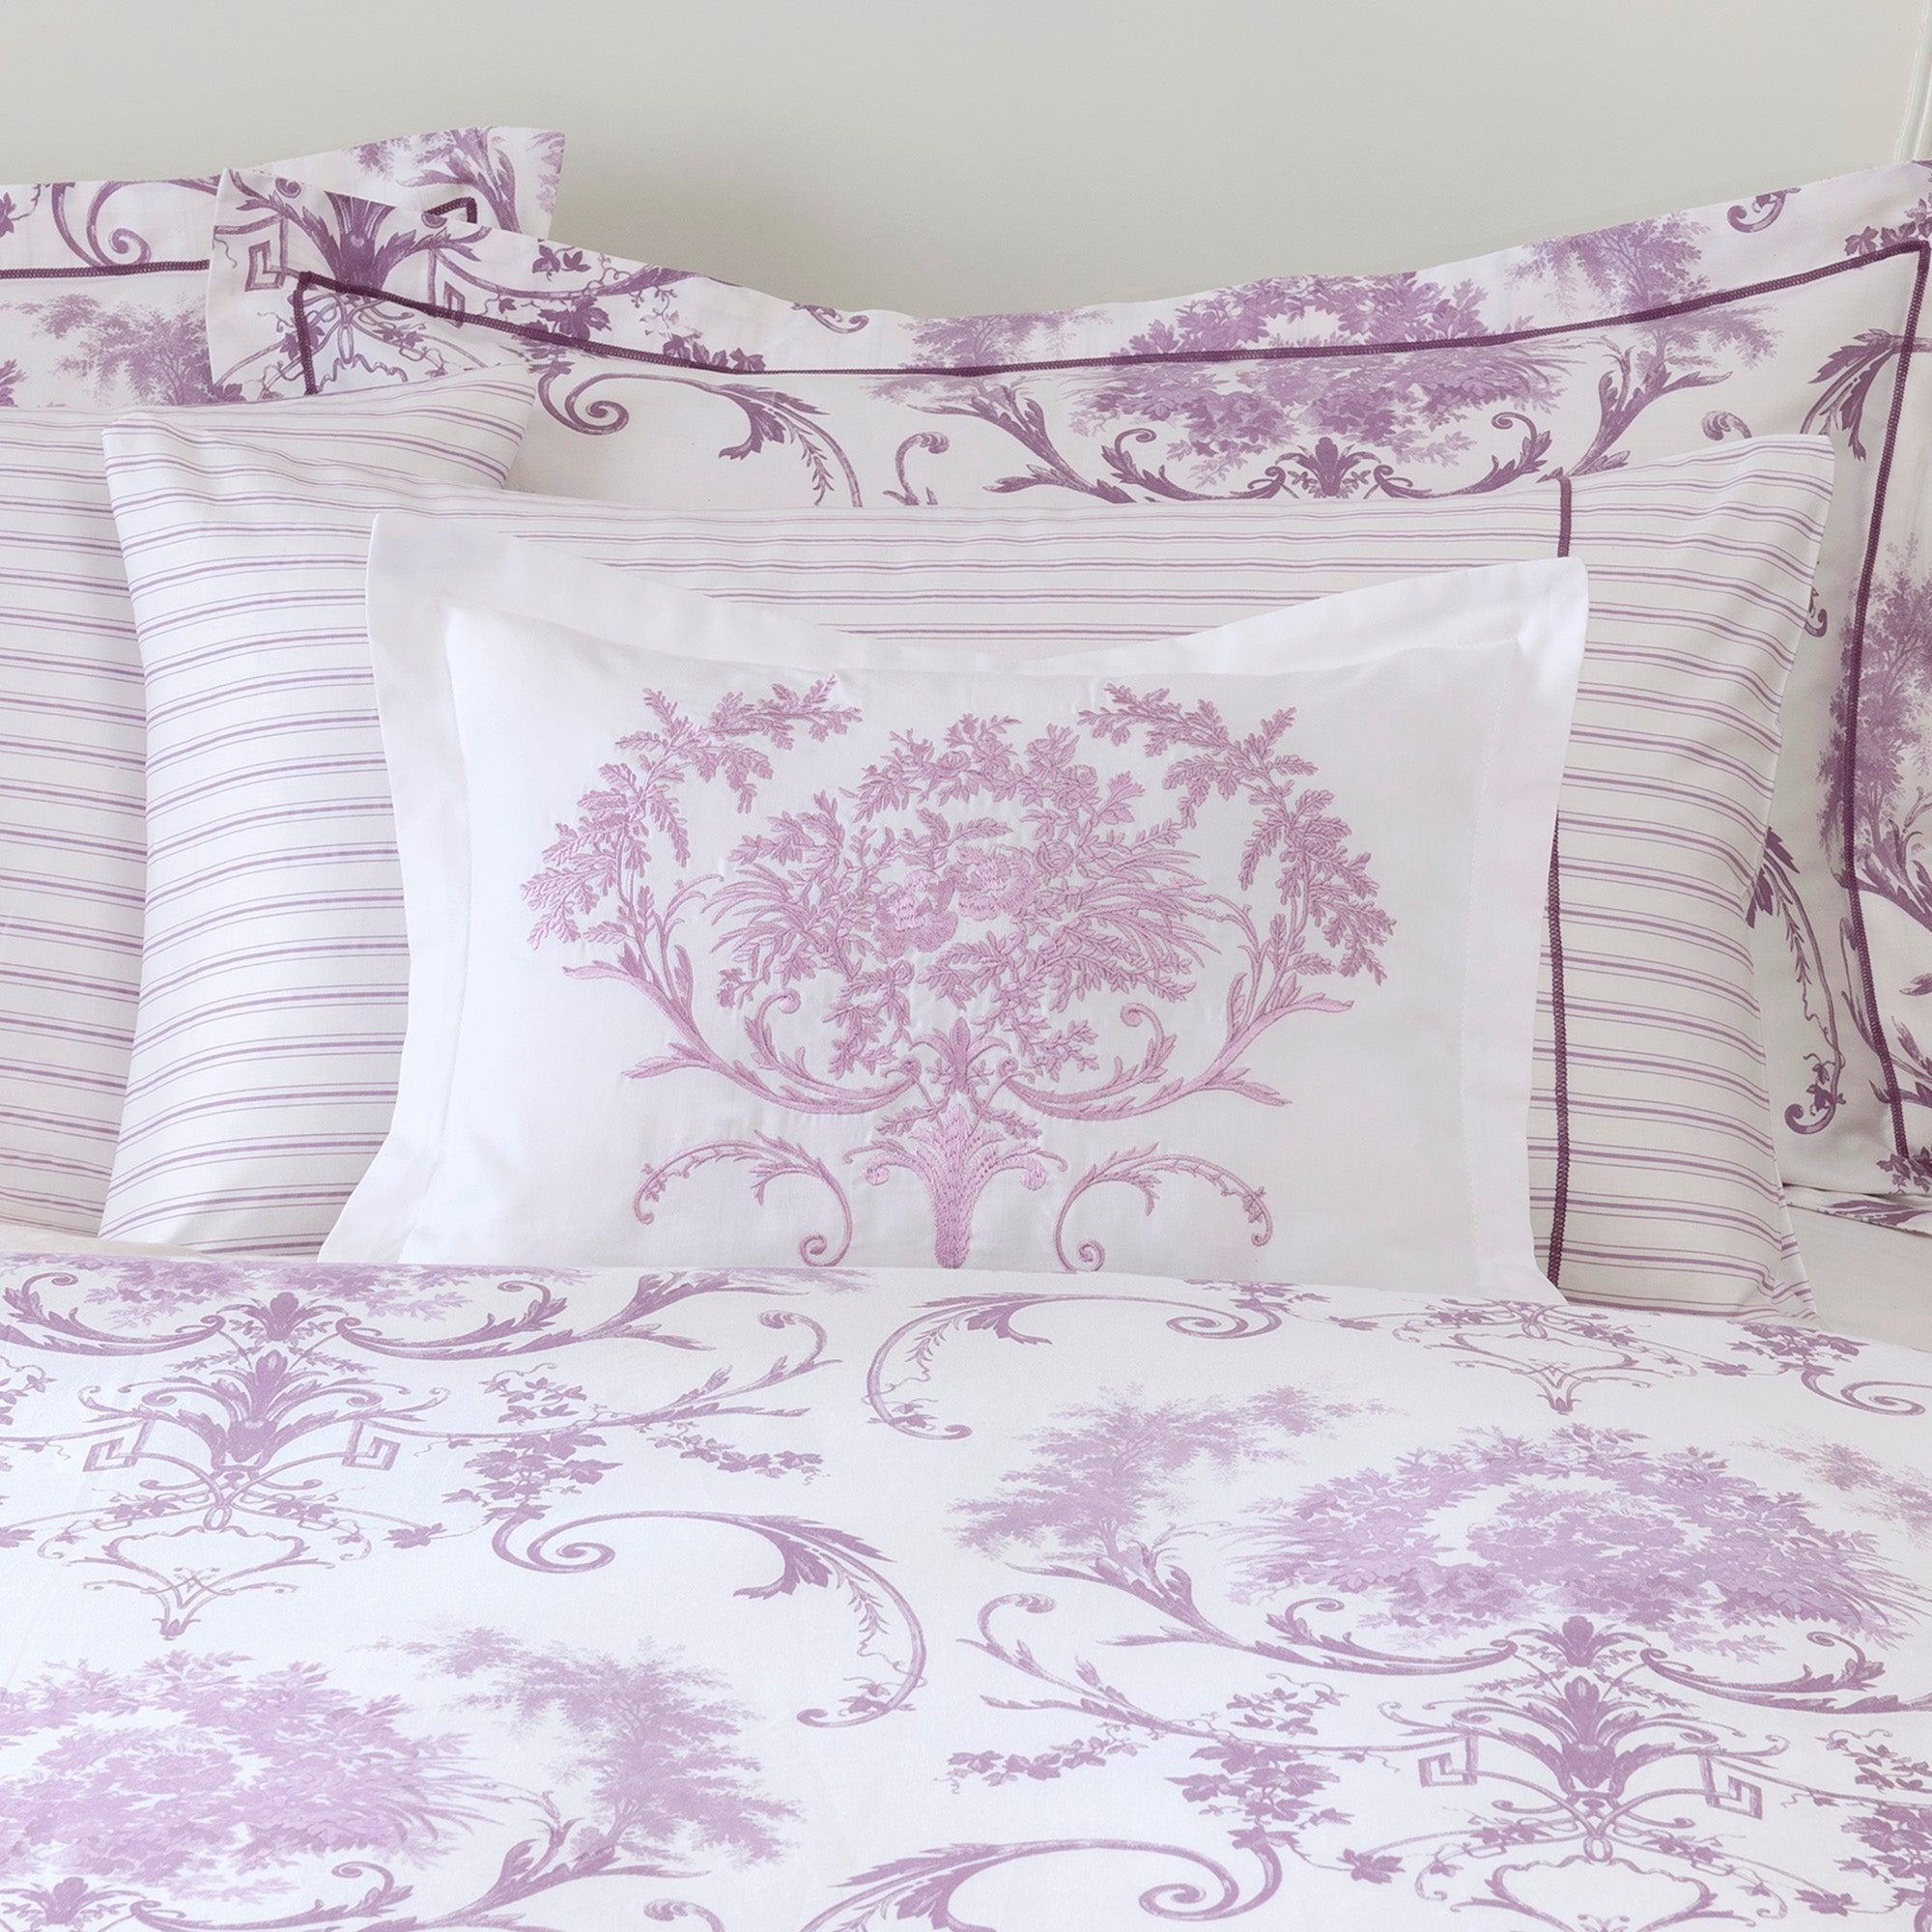 Dorma Heather Toile Collection Boudoir Cushion